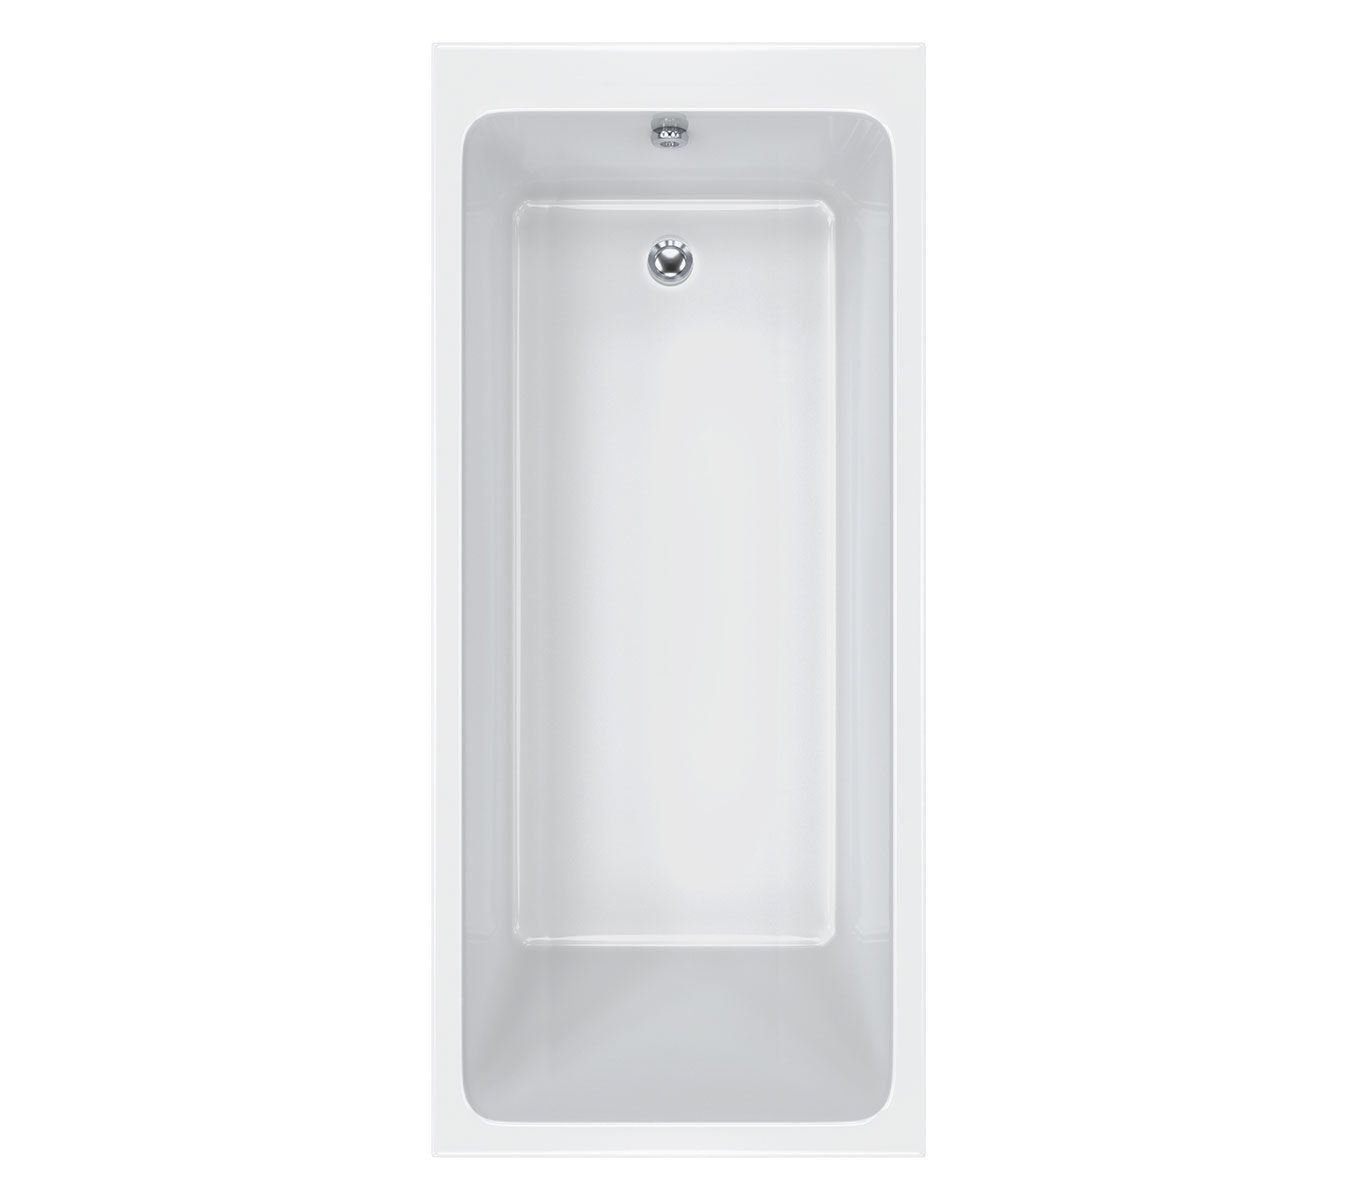 Carron Quantum Single Ended Bath 1800 x 725mm | Small bathrooms ...